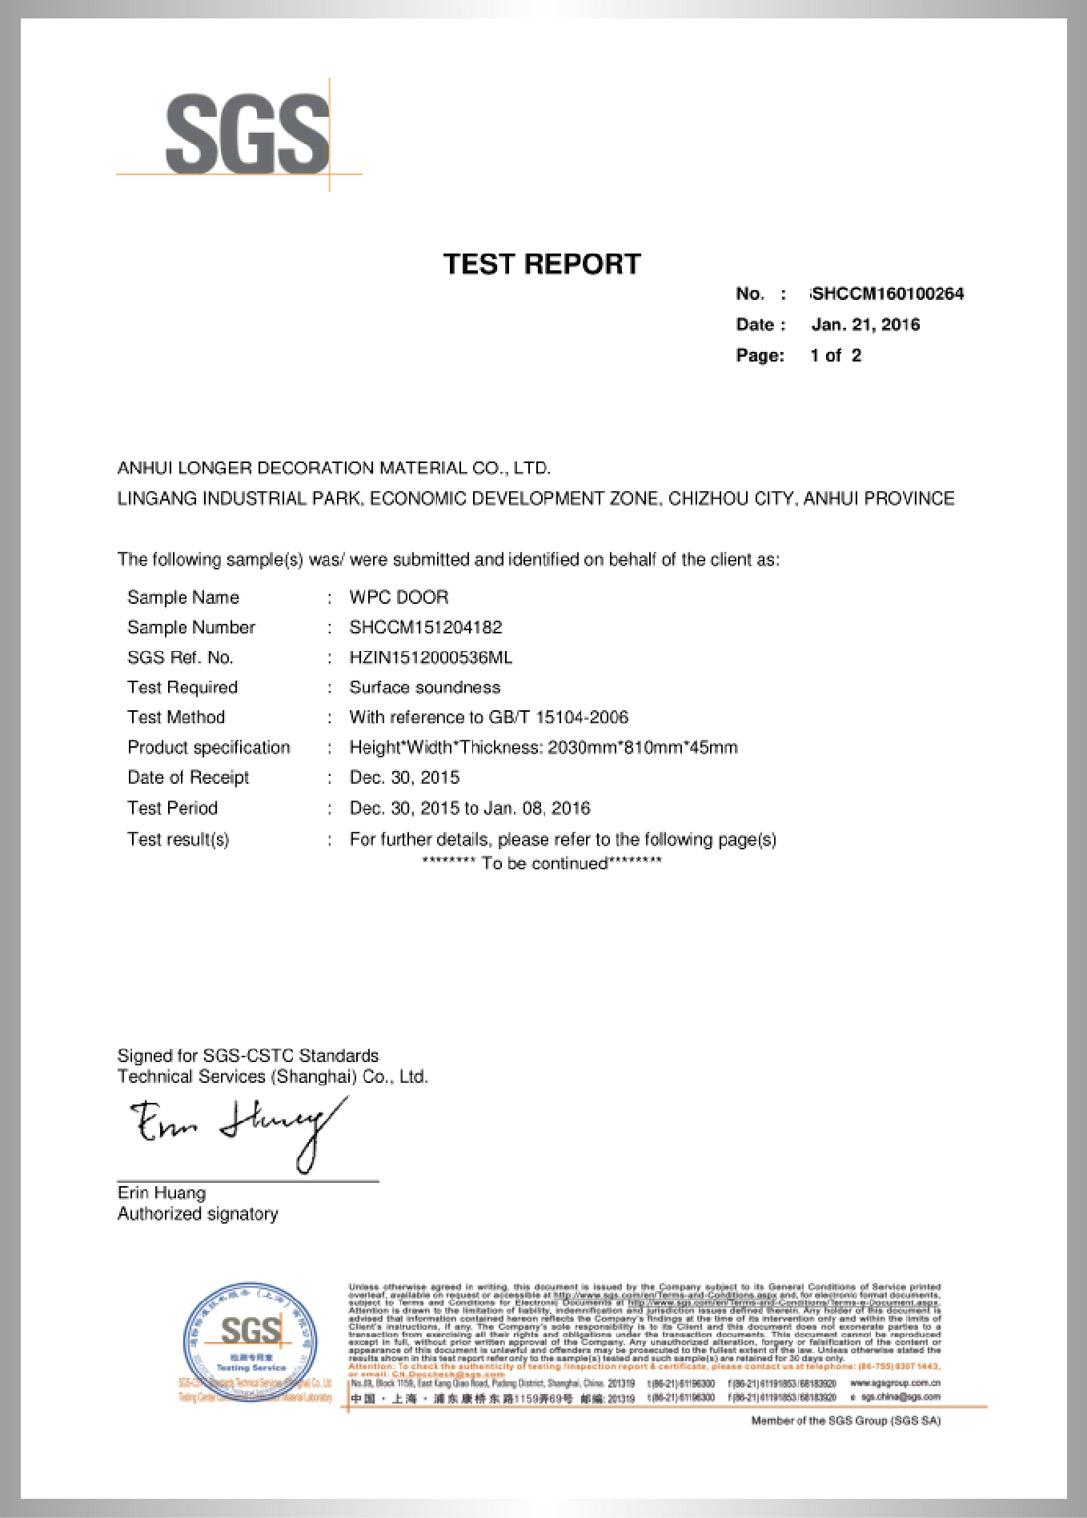 Surface Soundness Test